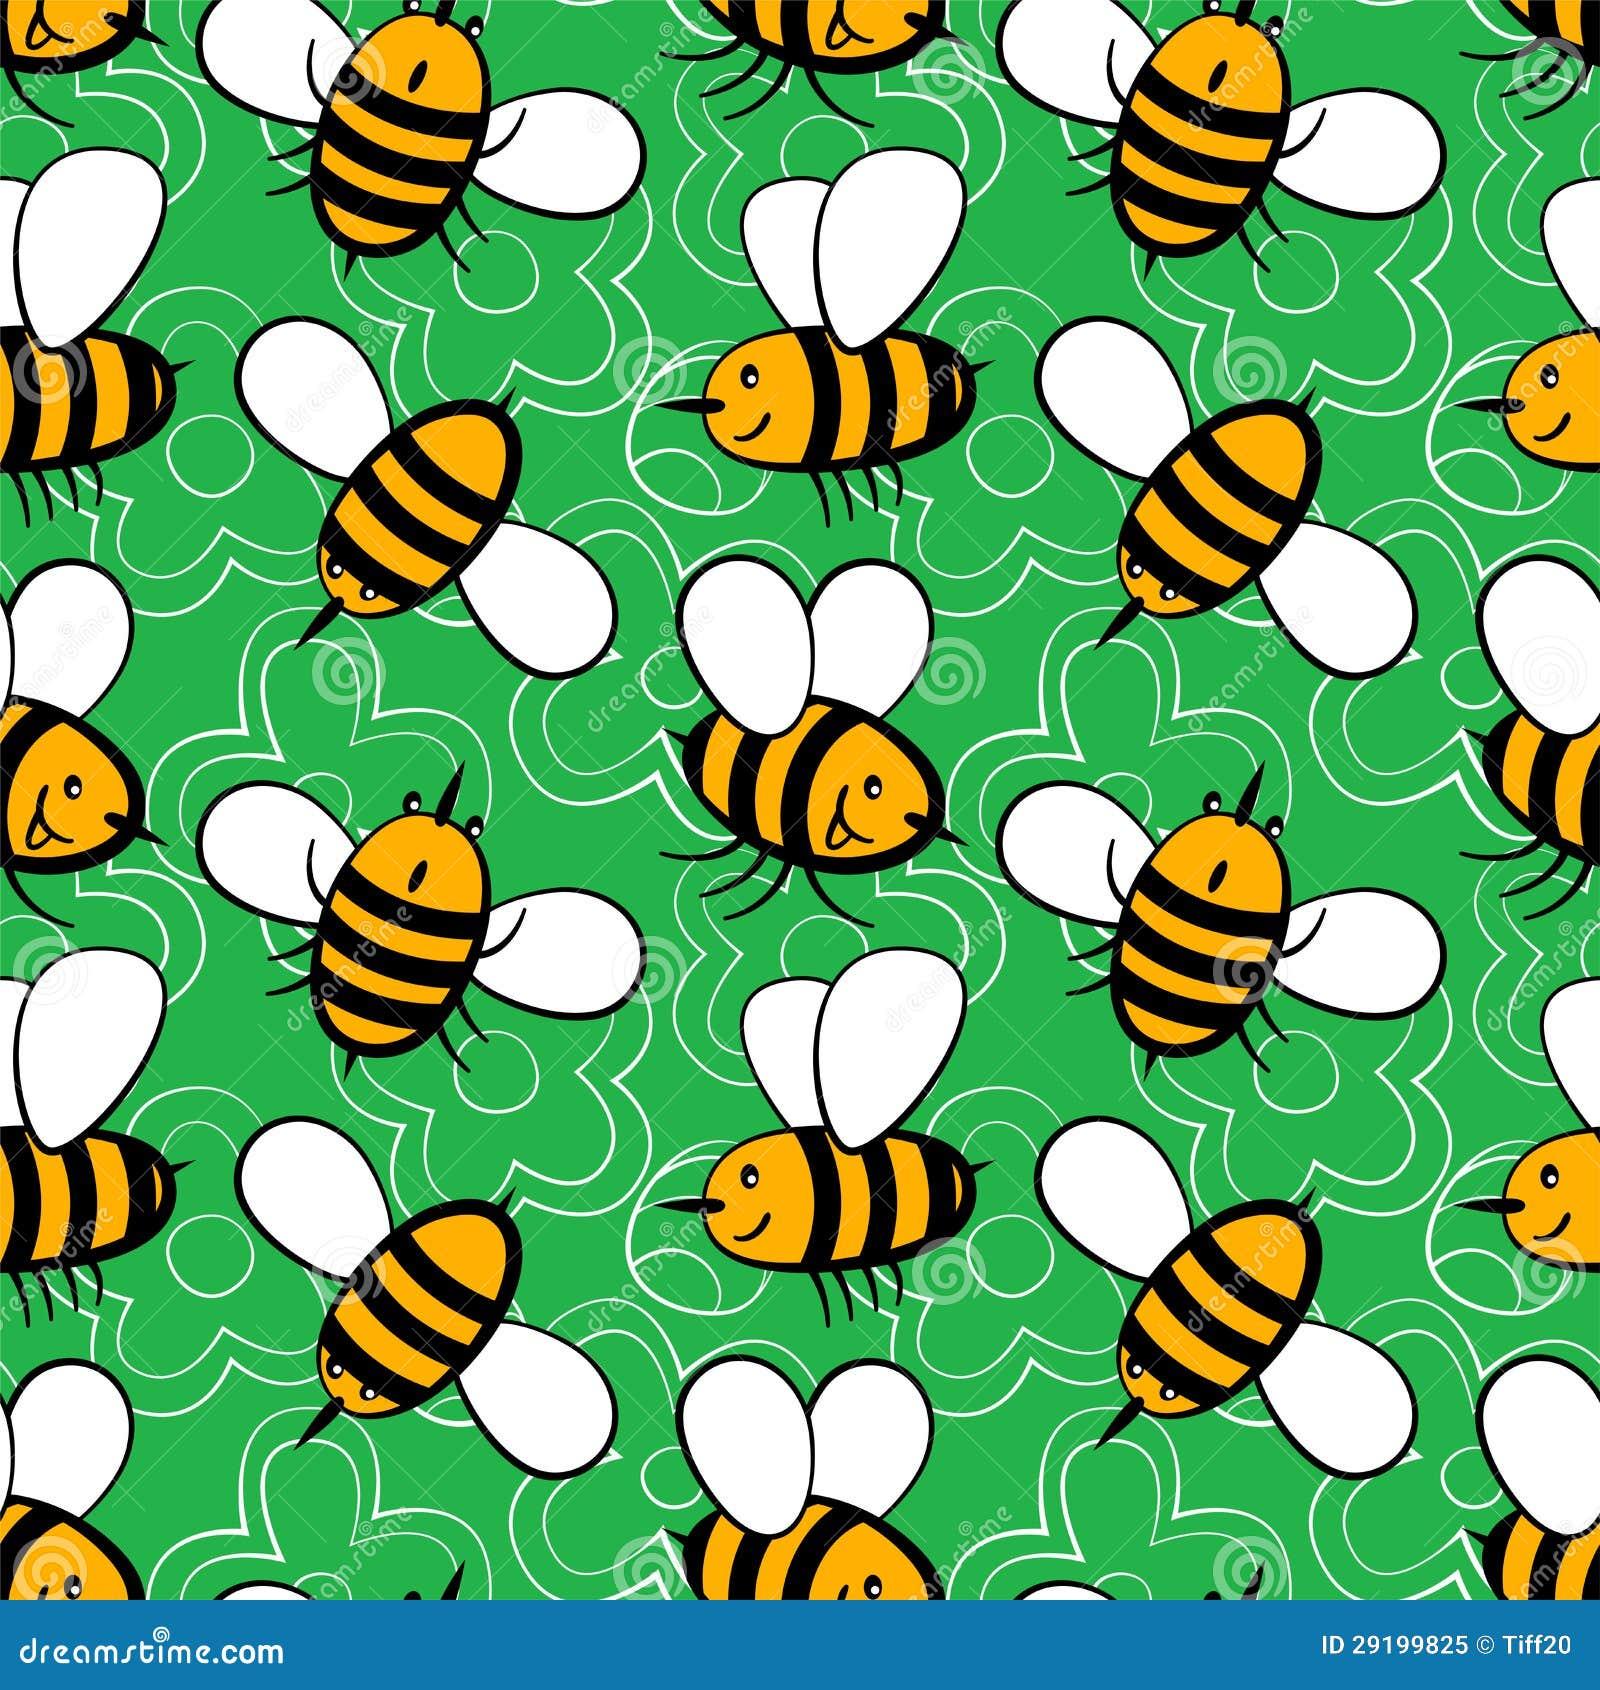 Cartoon Bees Royalty Free Stock Photo Image 29199825